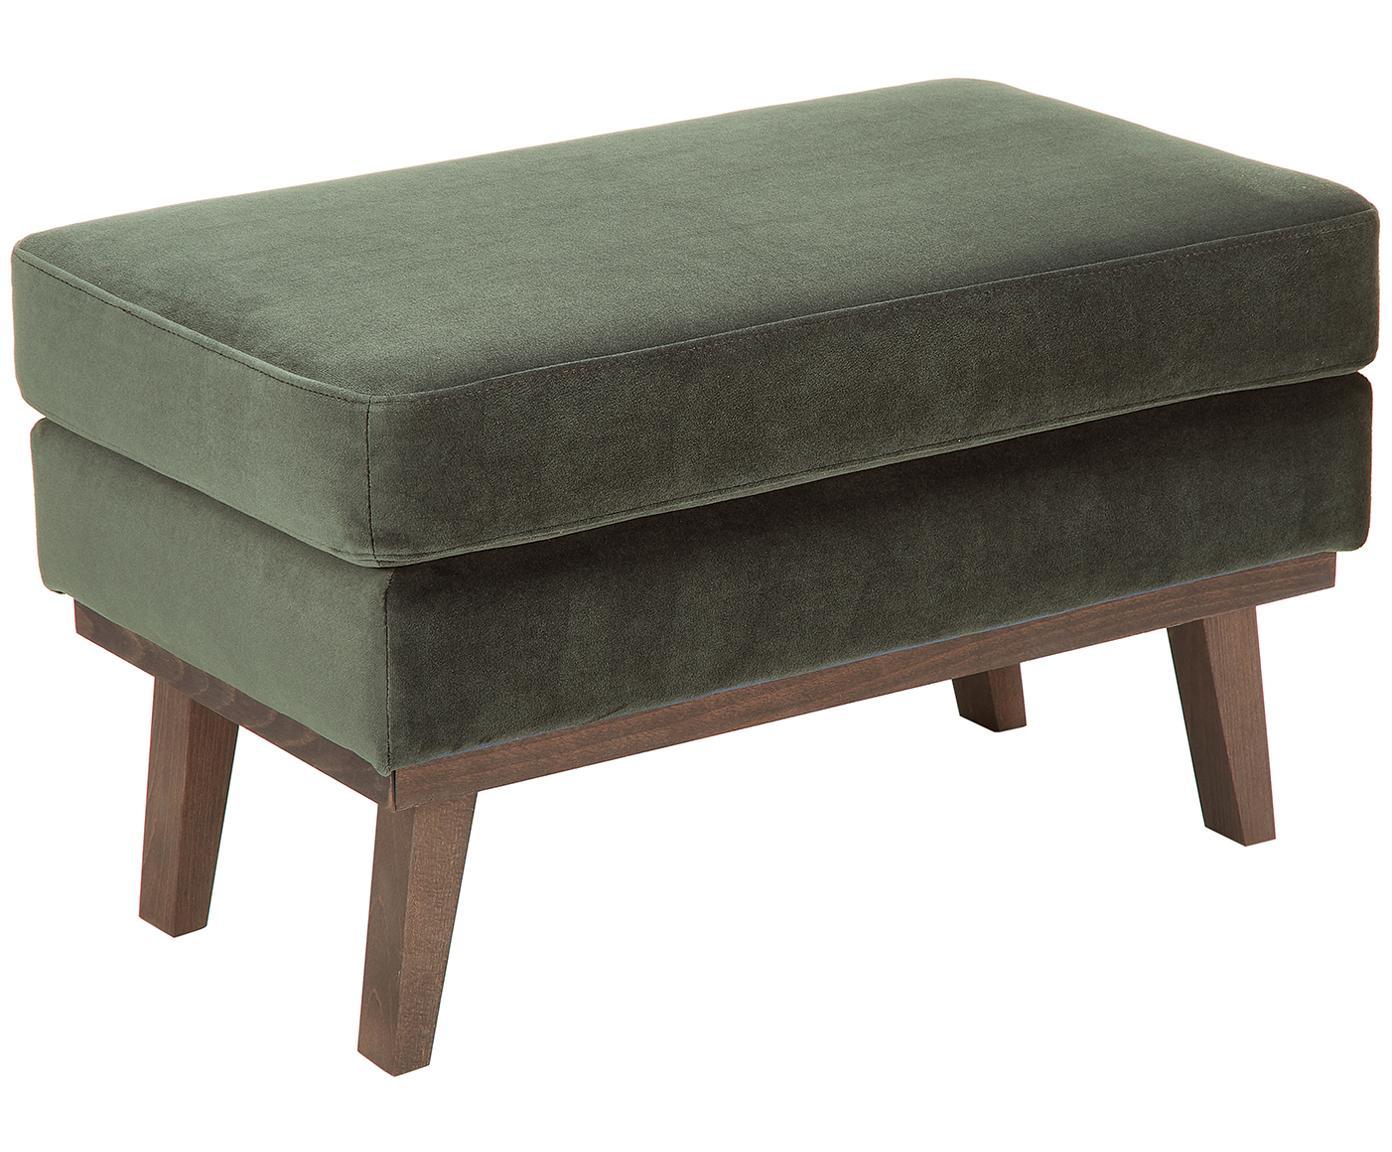 Sofa-Hocker Alva aus Samt, Bezug: Samt (Hochwertiger Polyes, Gestell: Massives Kiefernholz, Füße: Massives Buchenholz, gebe, Oliv, 74 x 30 cm